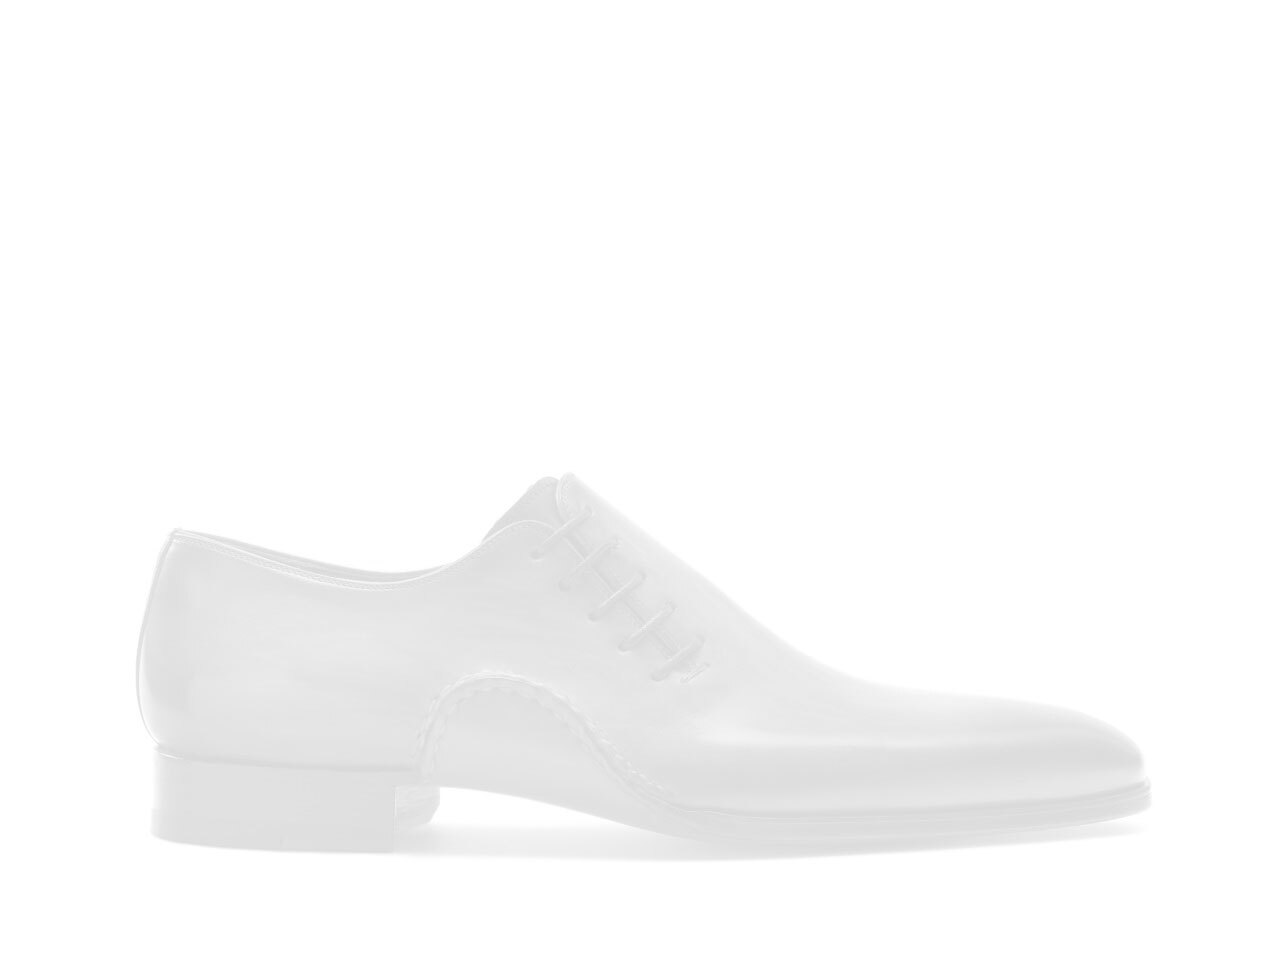 Pair of the Magnanni Leyton Black Men's Oxford Shoes